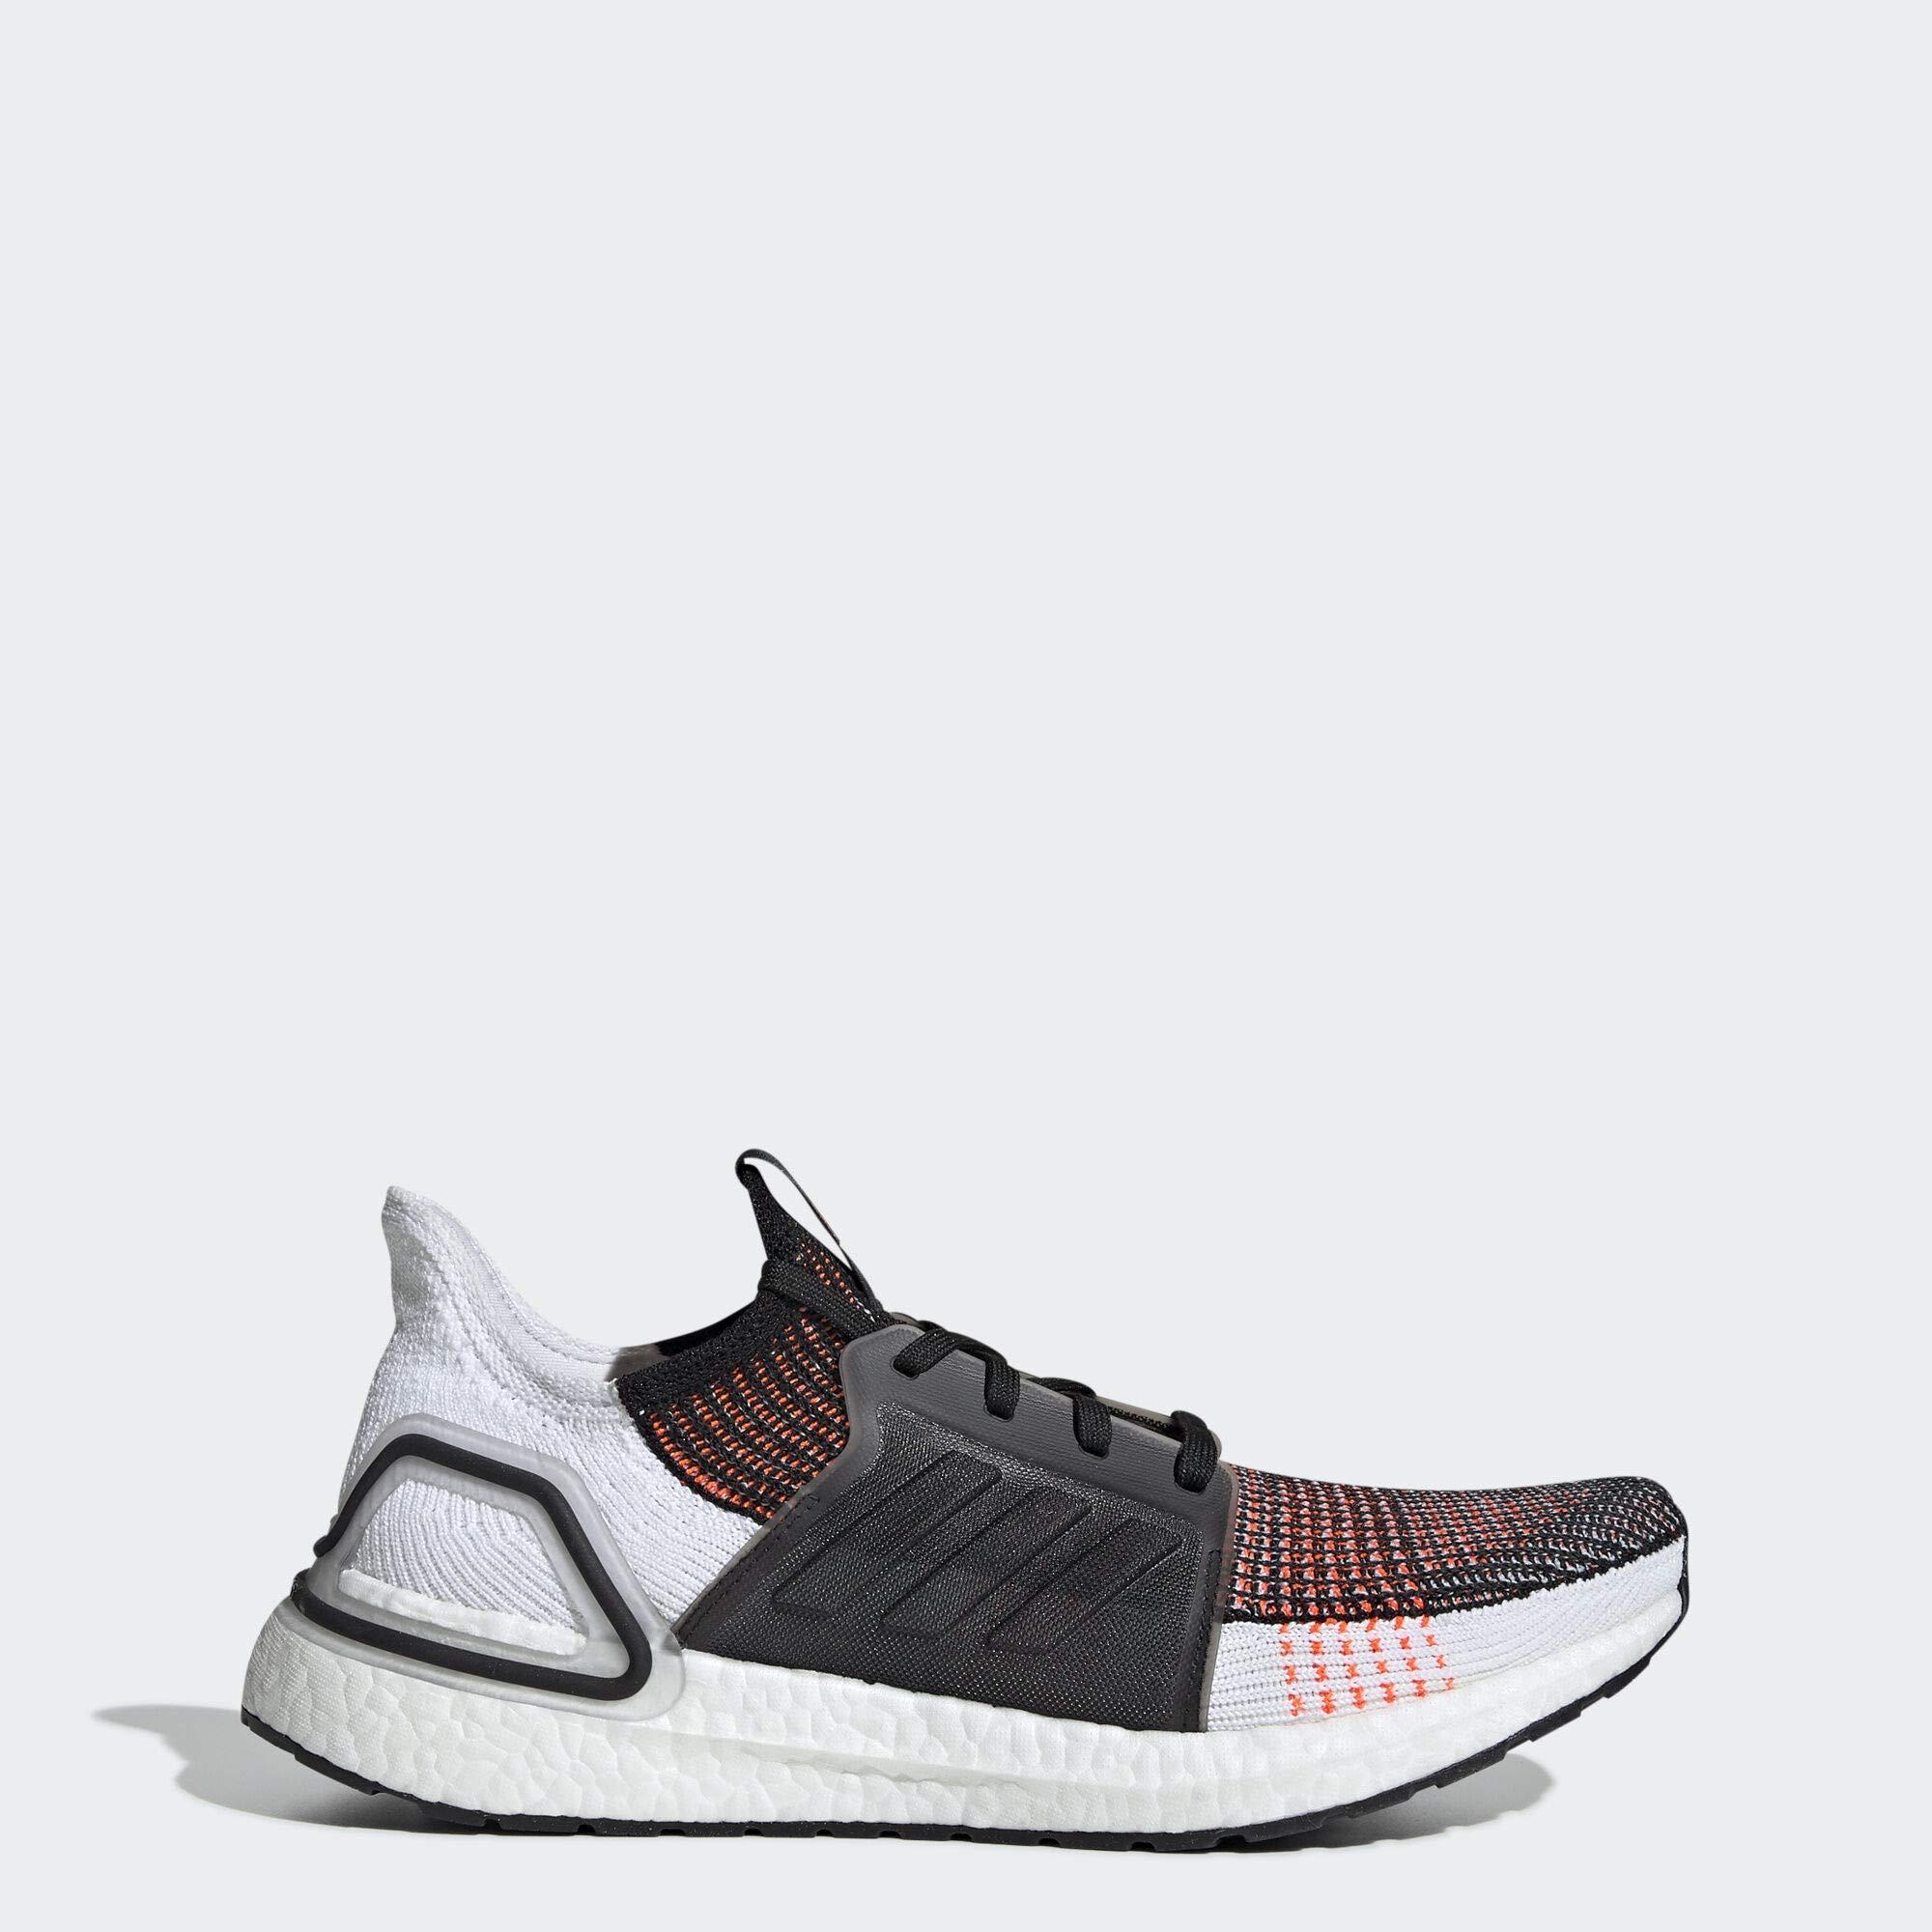 adidas Men's Ultraboost 19 Running Shoe, Black/White/Solar Orange, 10.5 M US by adidas